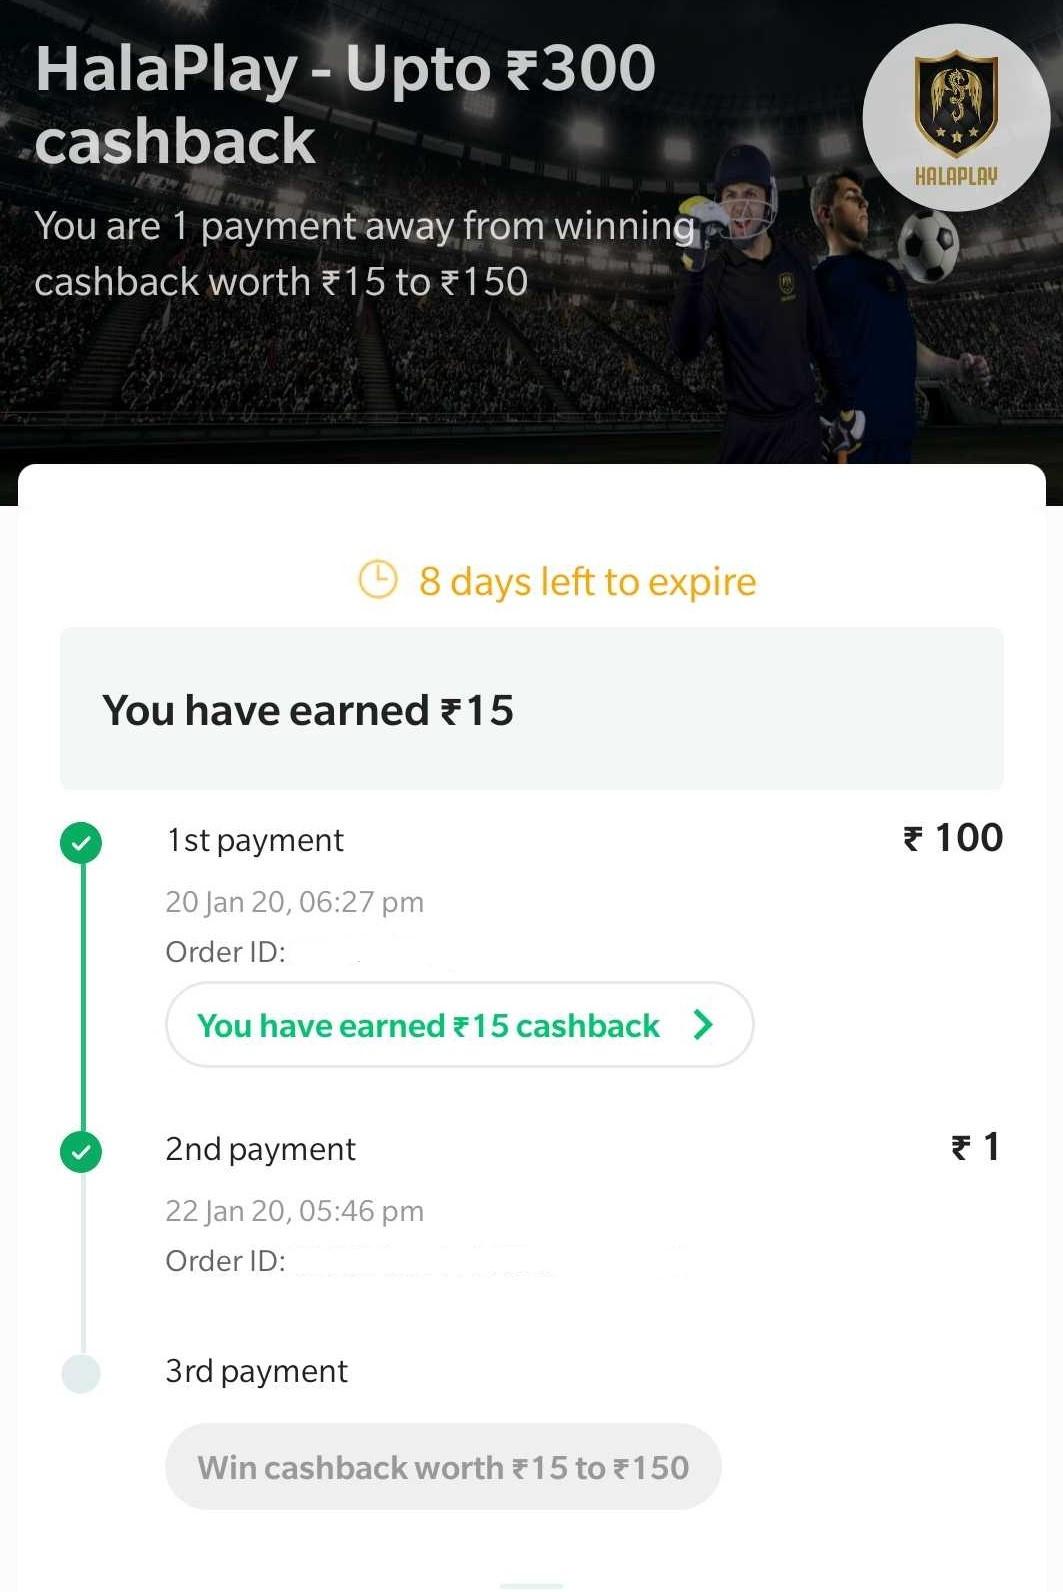 A screenshot of HalaPlay cashback offer